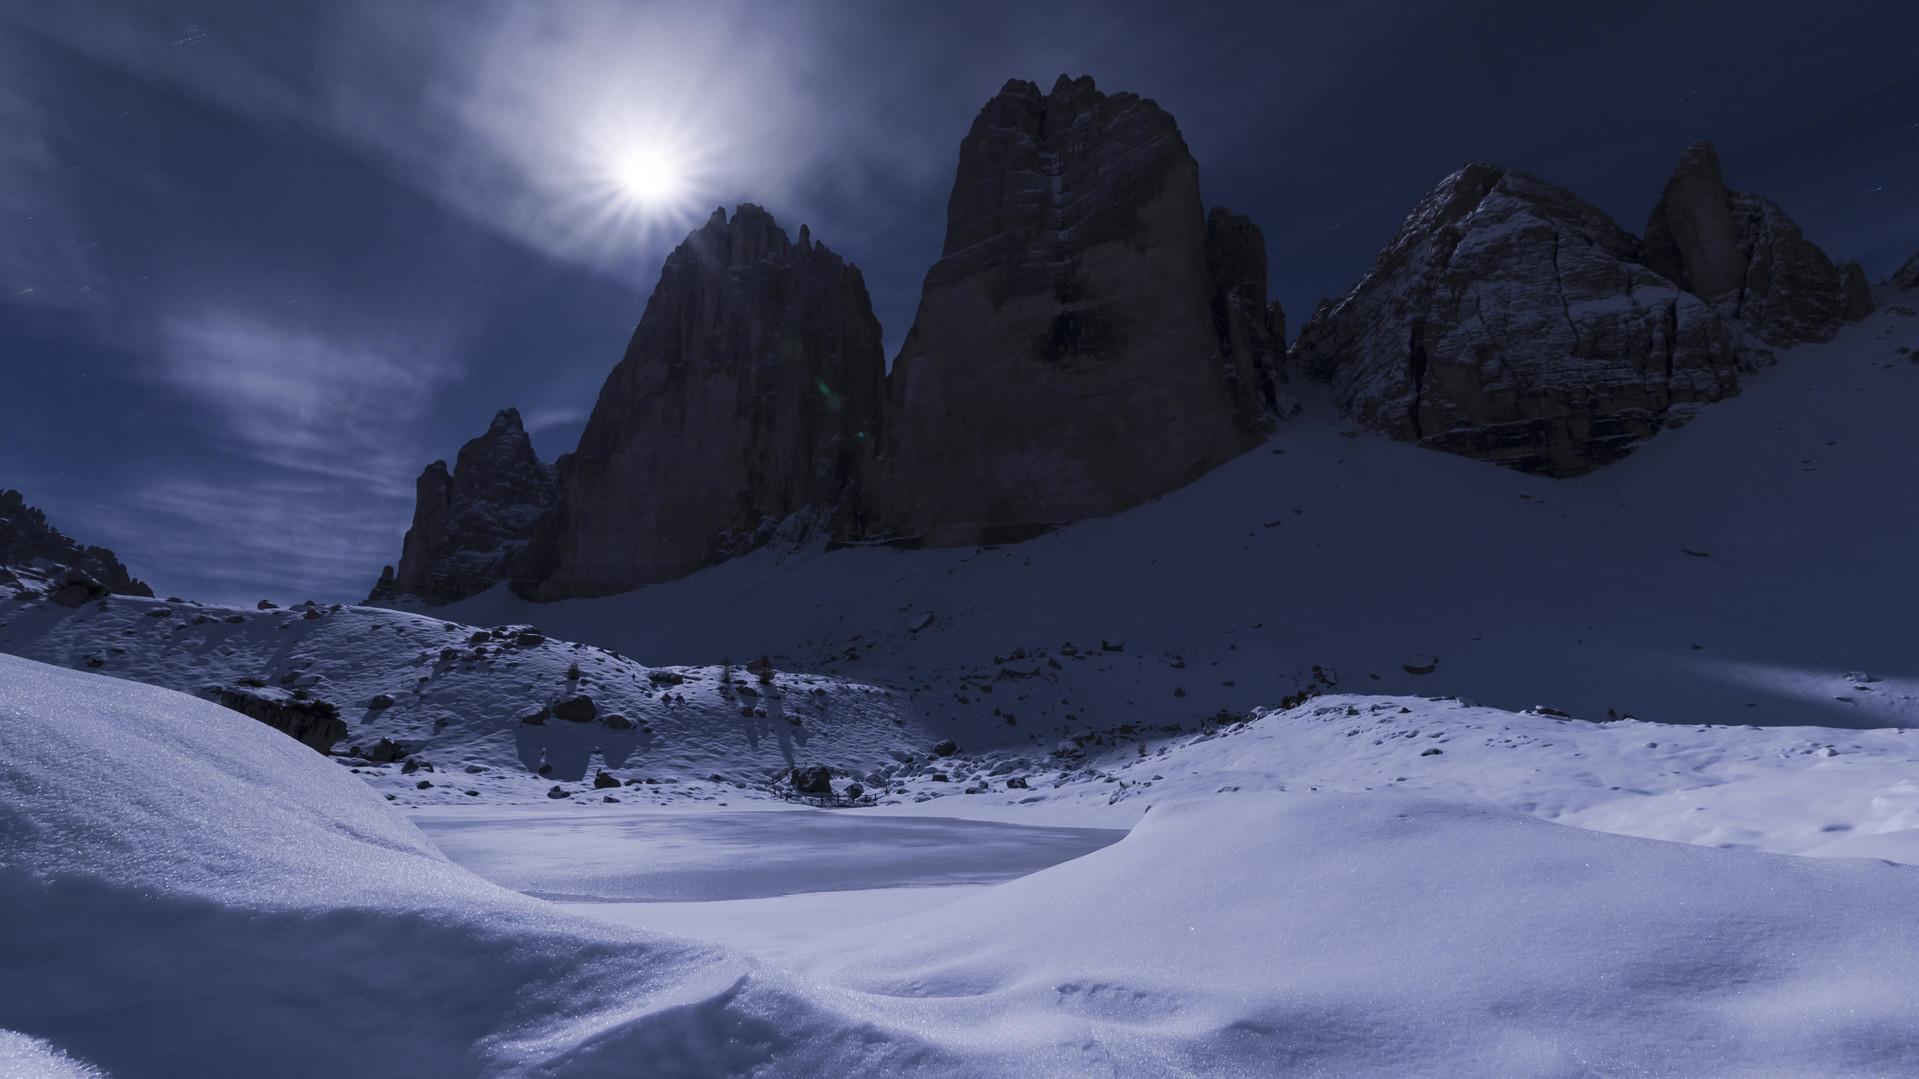 Time lapse Tre cime di lavaredo luna.mp4